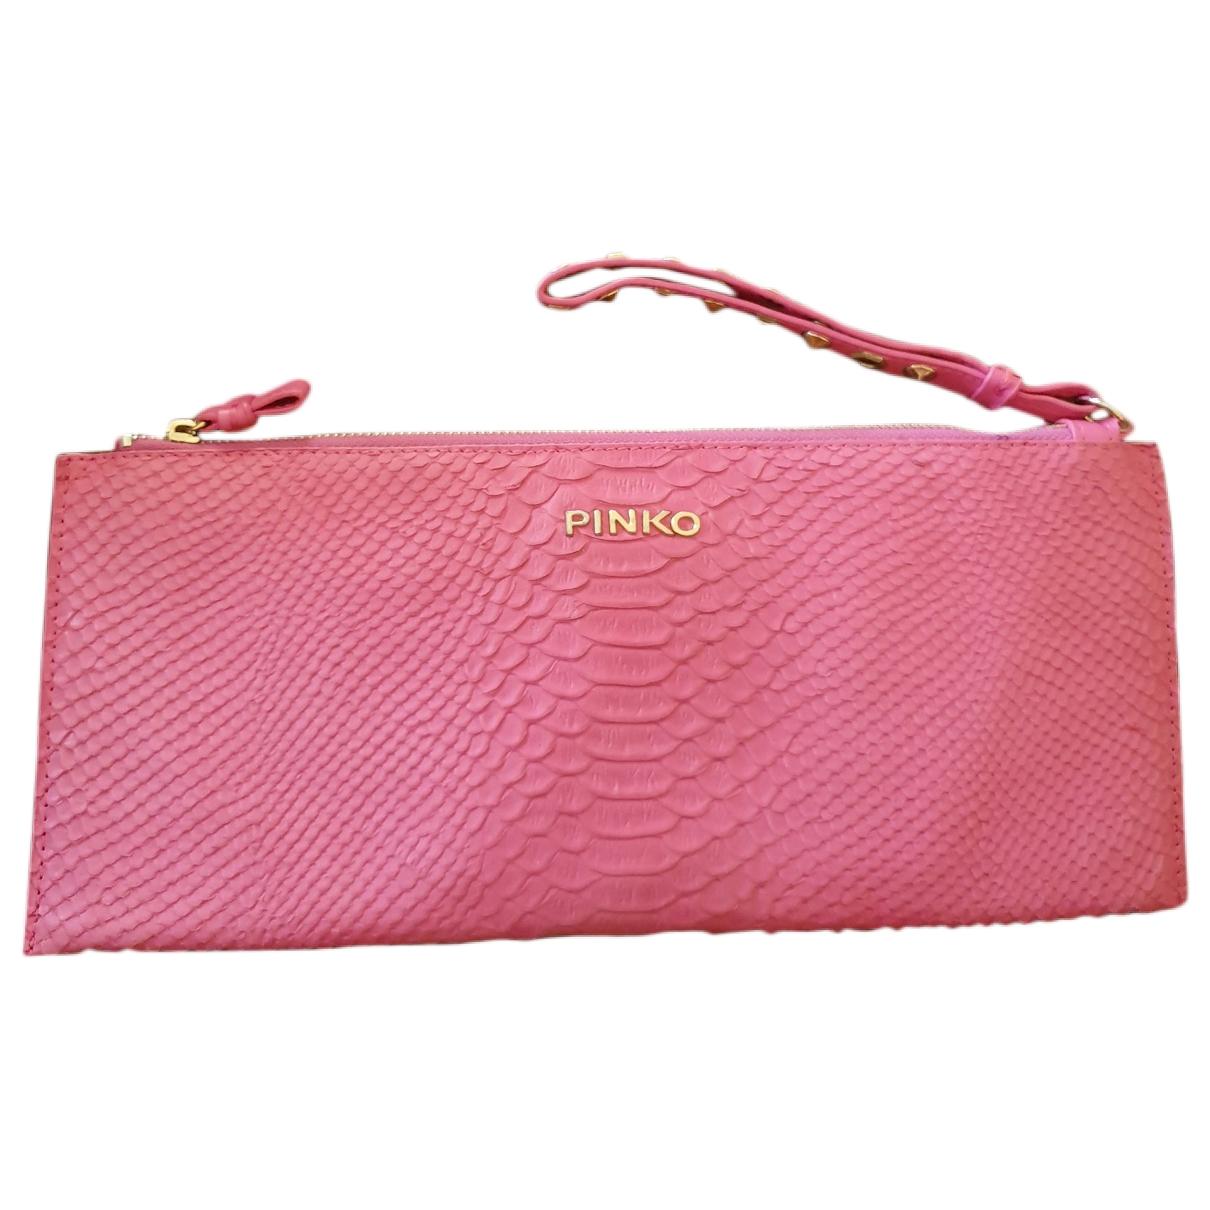 Pinko \N Pink Leather Clutch bag for Women \N